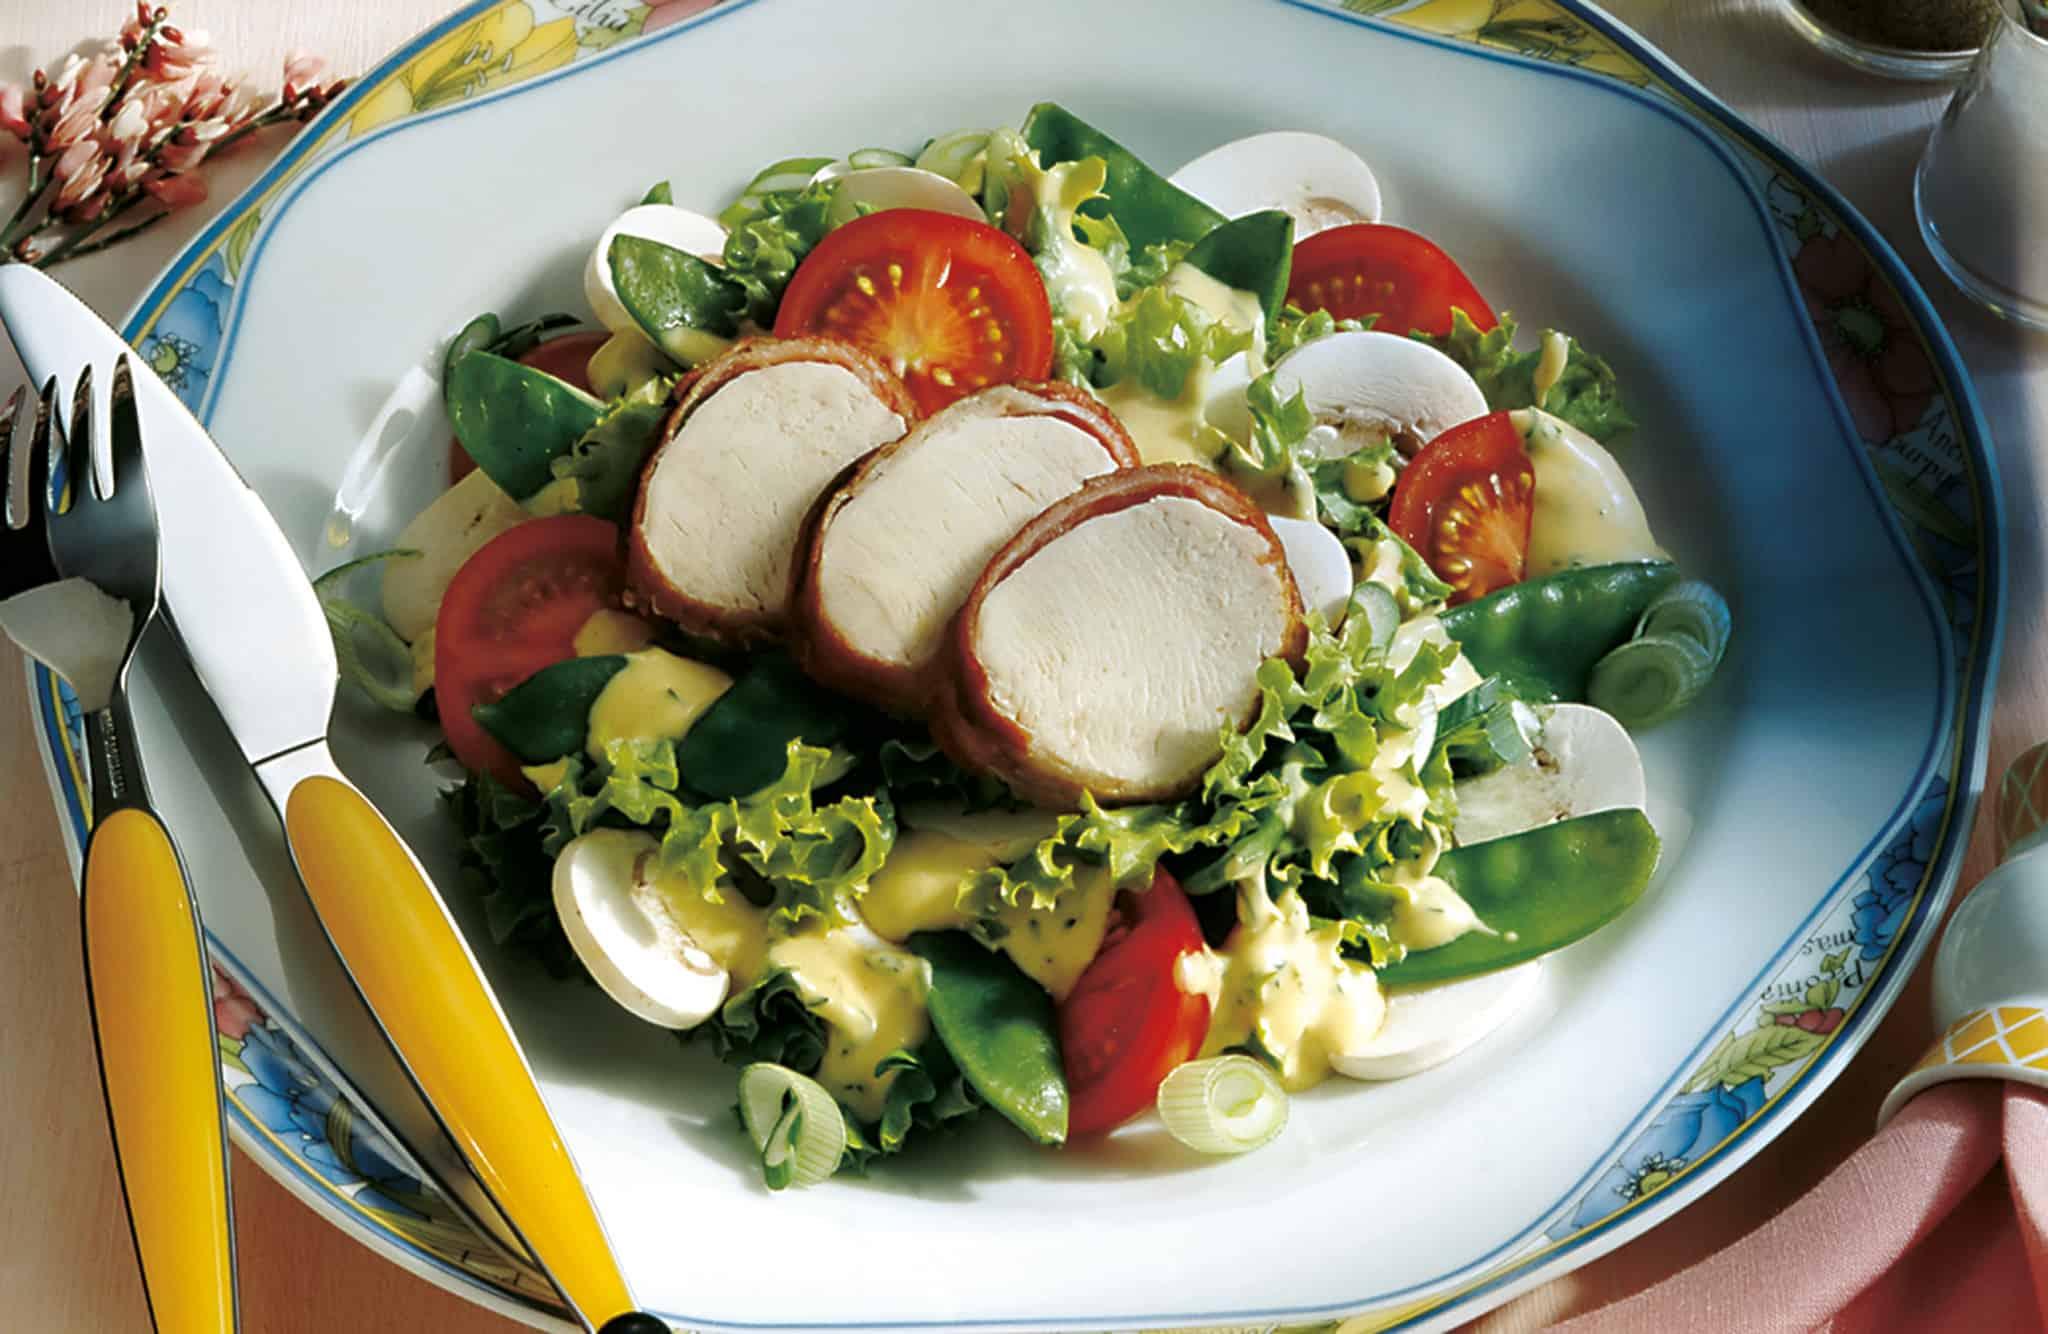 r gener raps l gemischter salat mit honig senf dressing und putenbrust. Black Bedroom Furniture Sets. Home Design Ideas